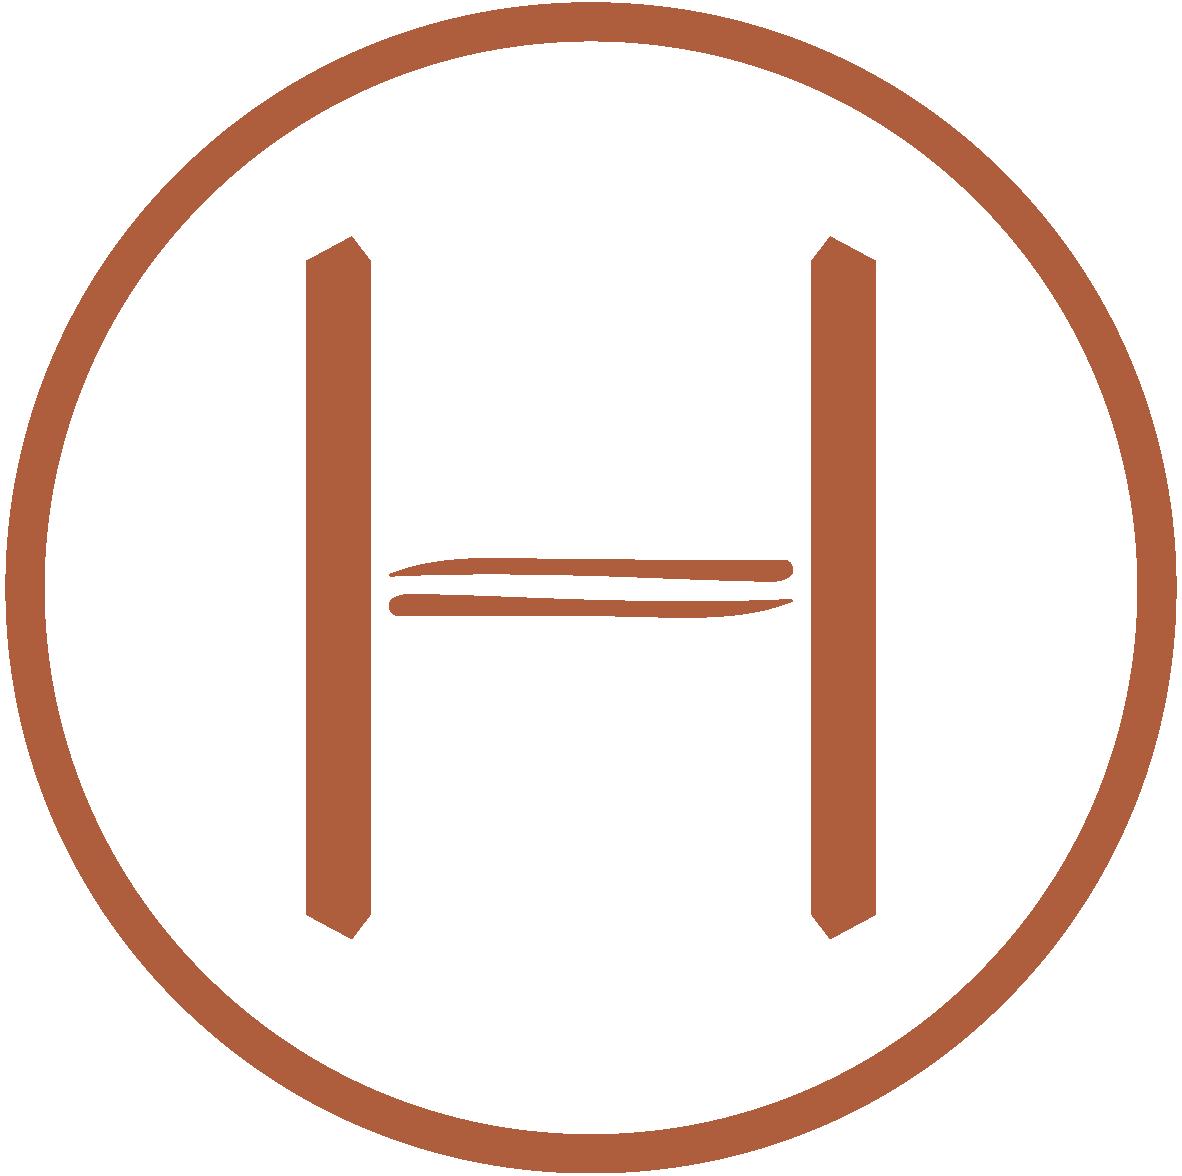 Horseneckwines_HMark_strokecircle_rust_RGB.png